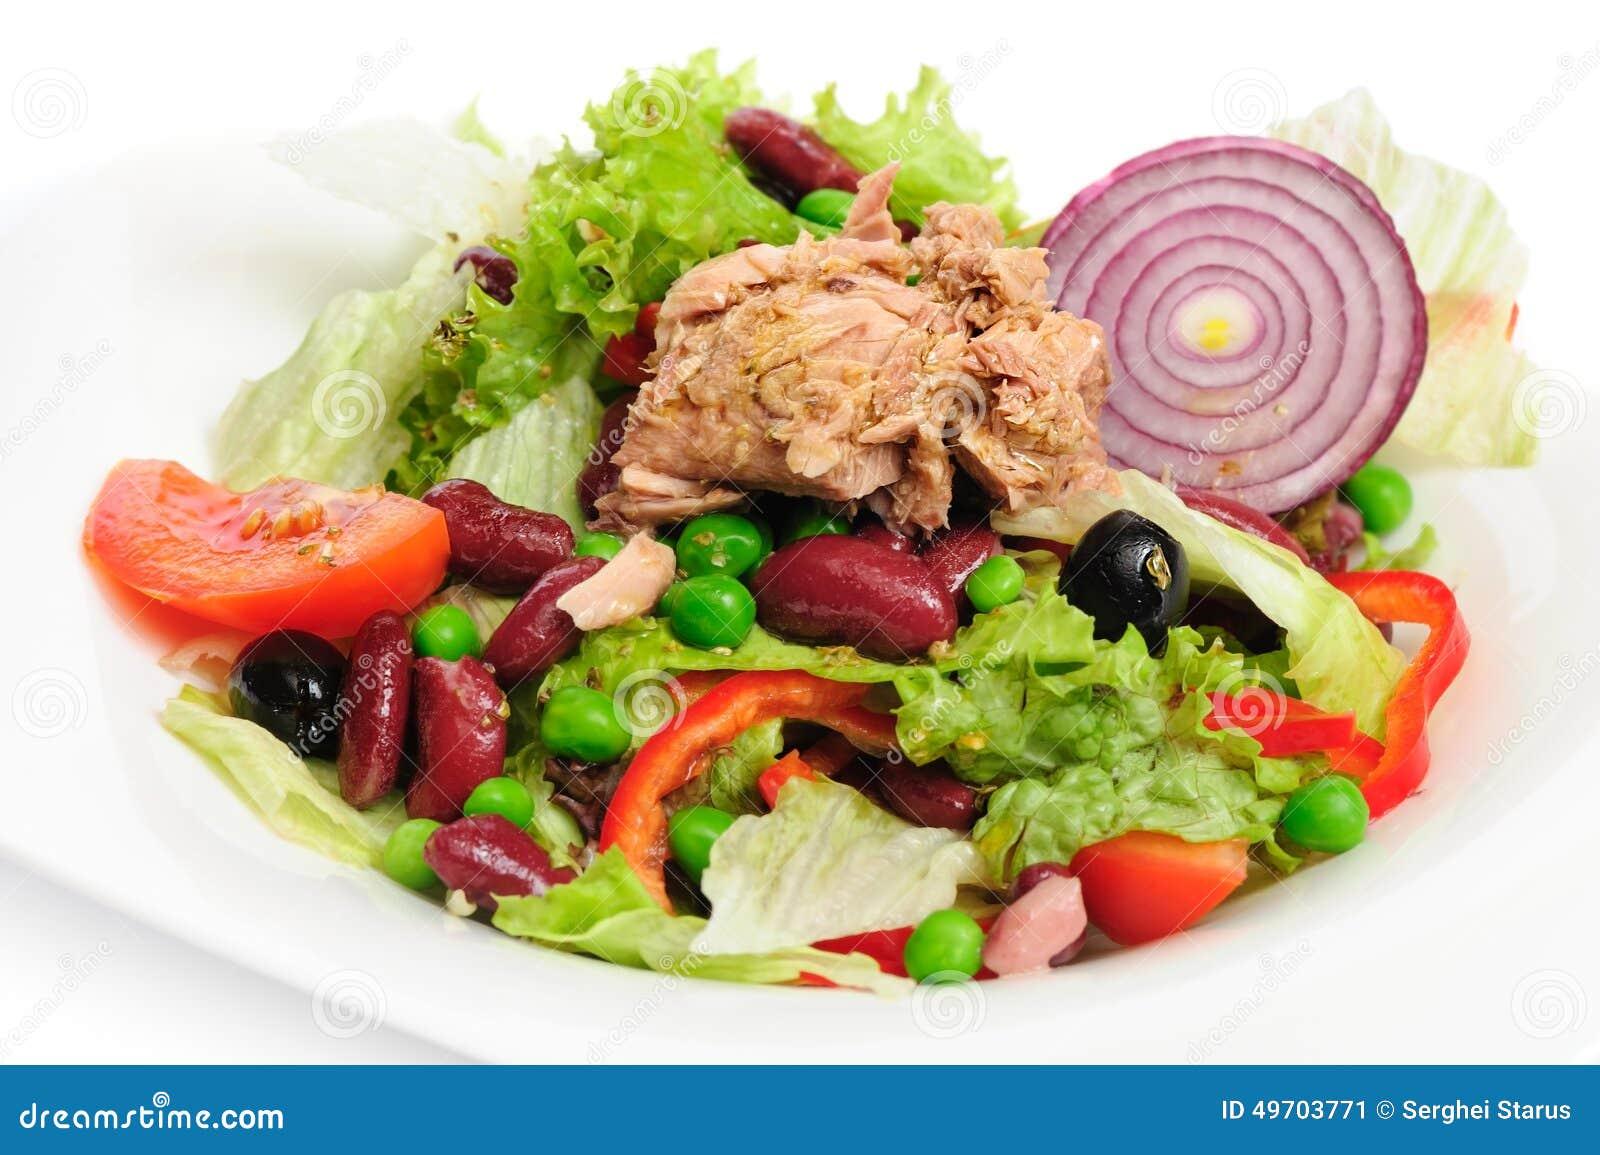 Tuna And Vegetable Salad Stock Photo Image 49703771